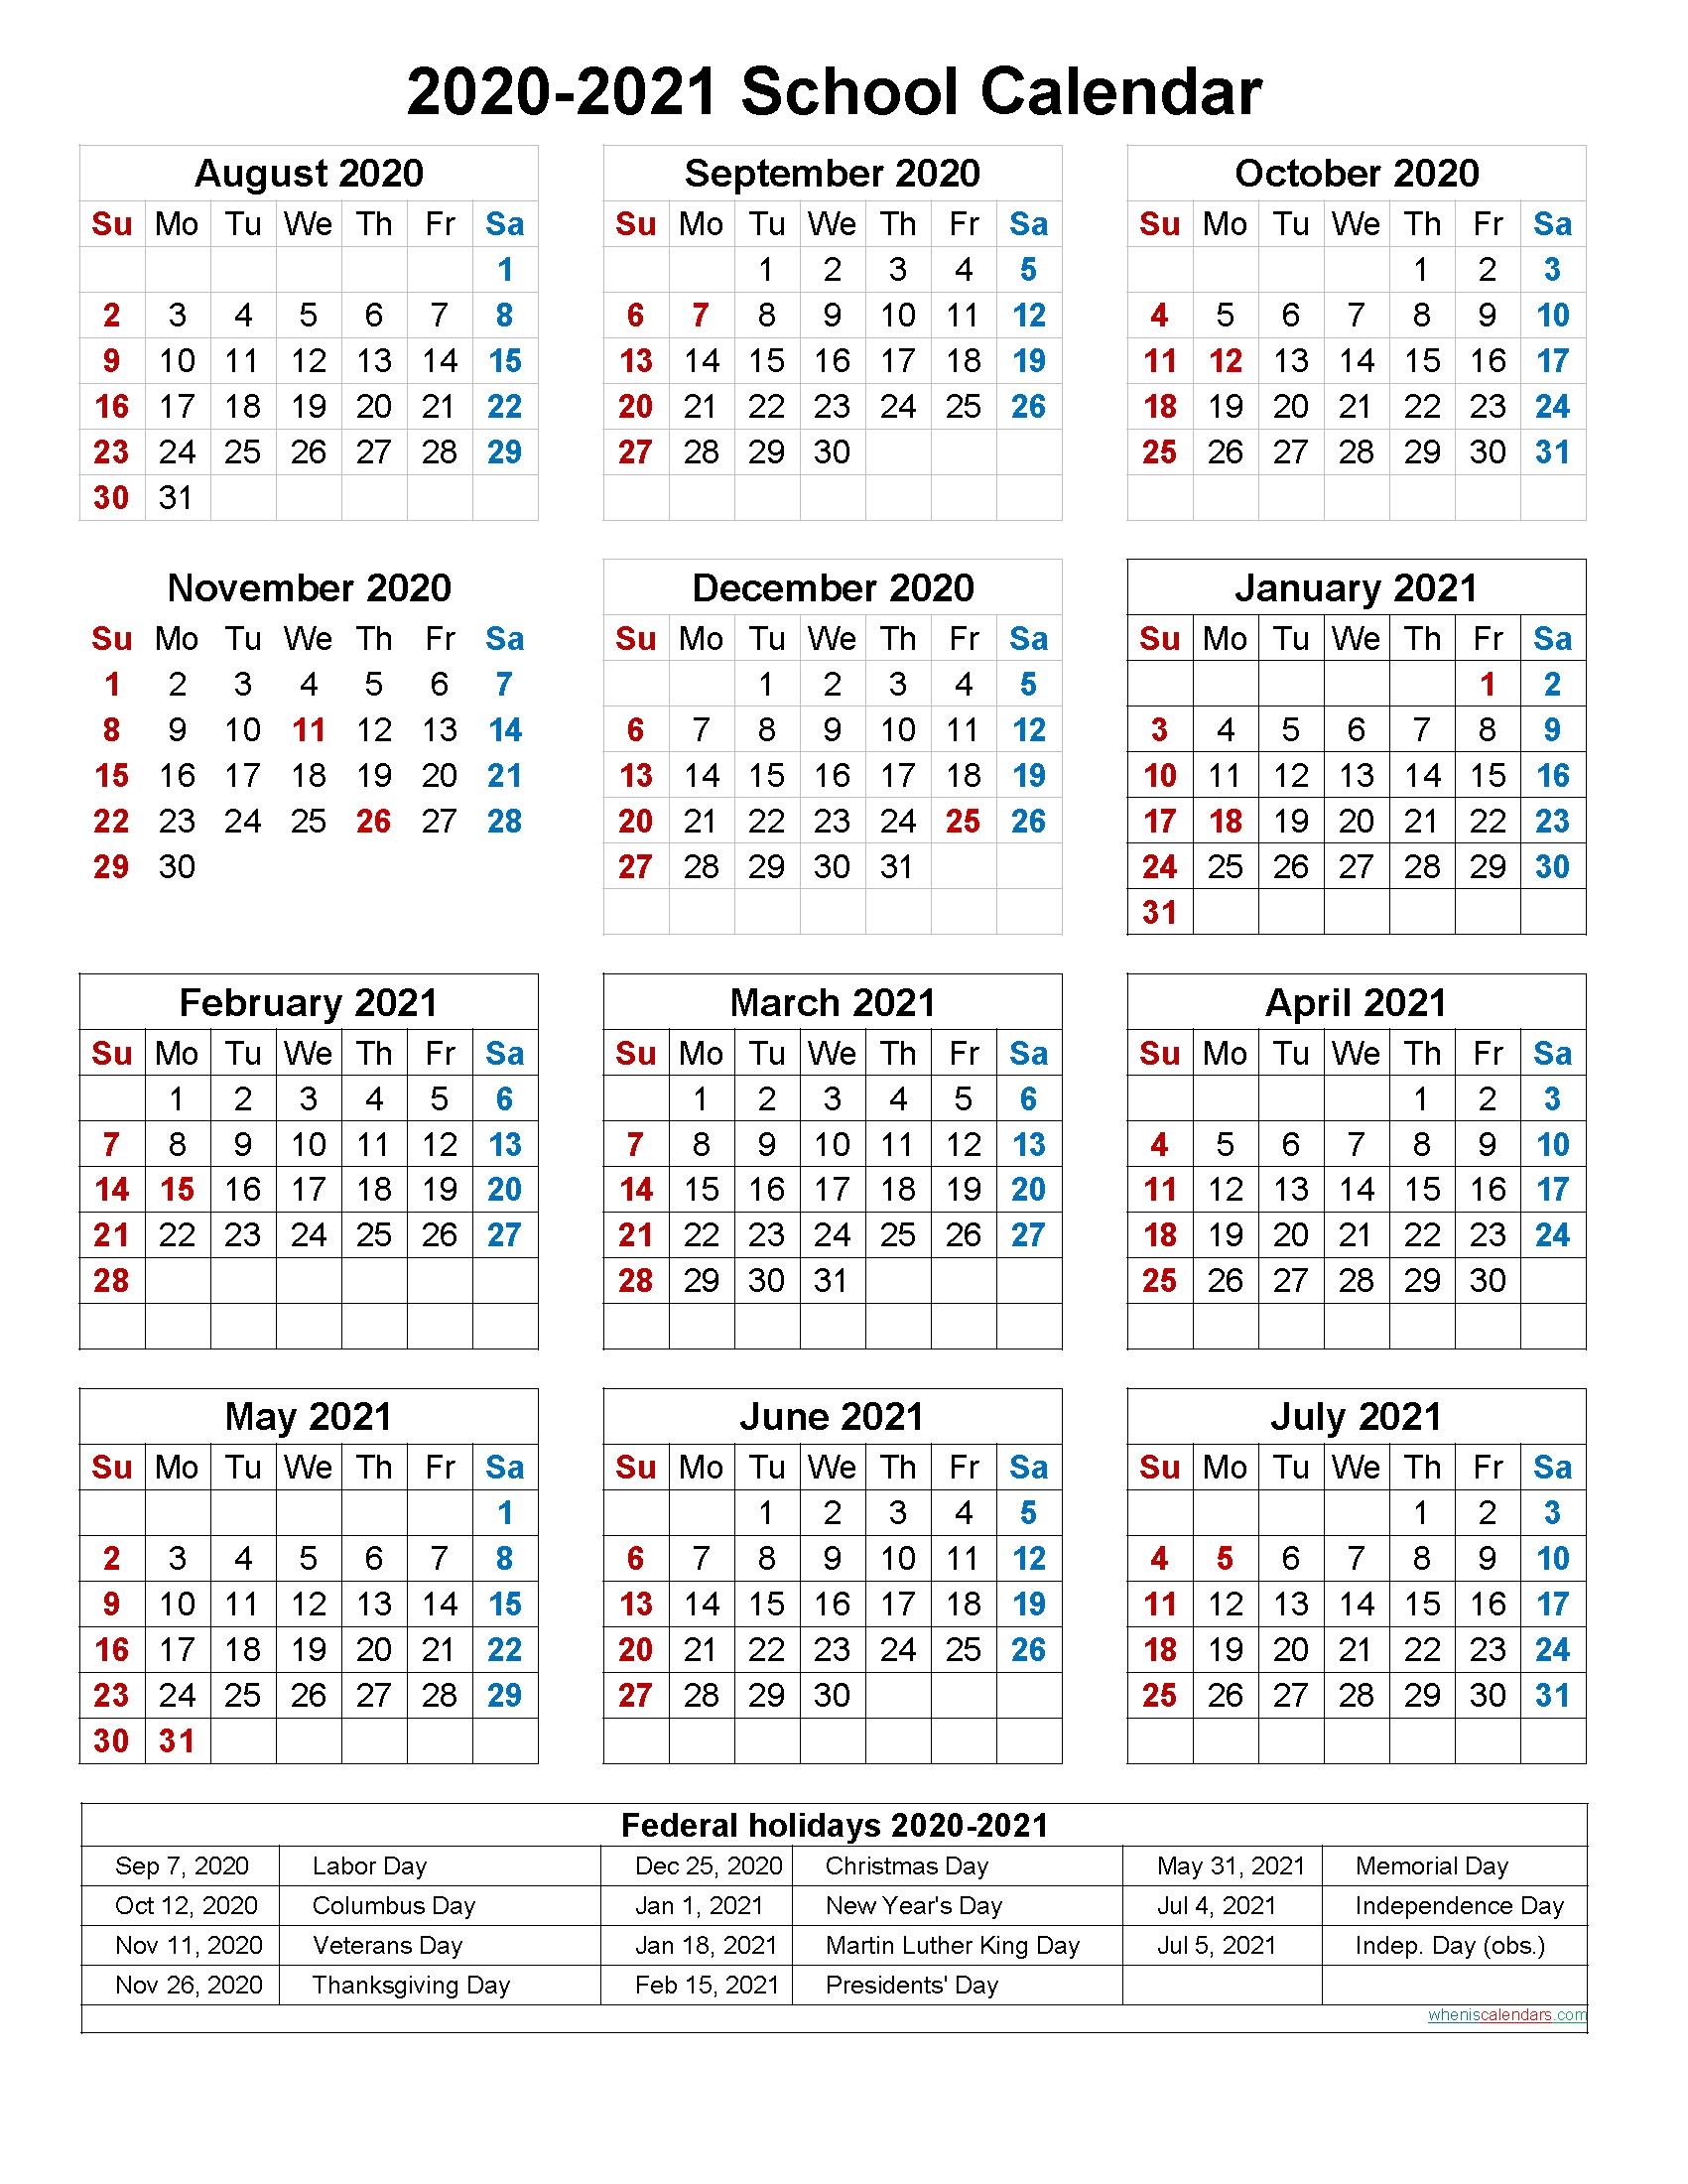 Calendar With School Holidays 2021-2021 School Holiday Calender